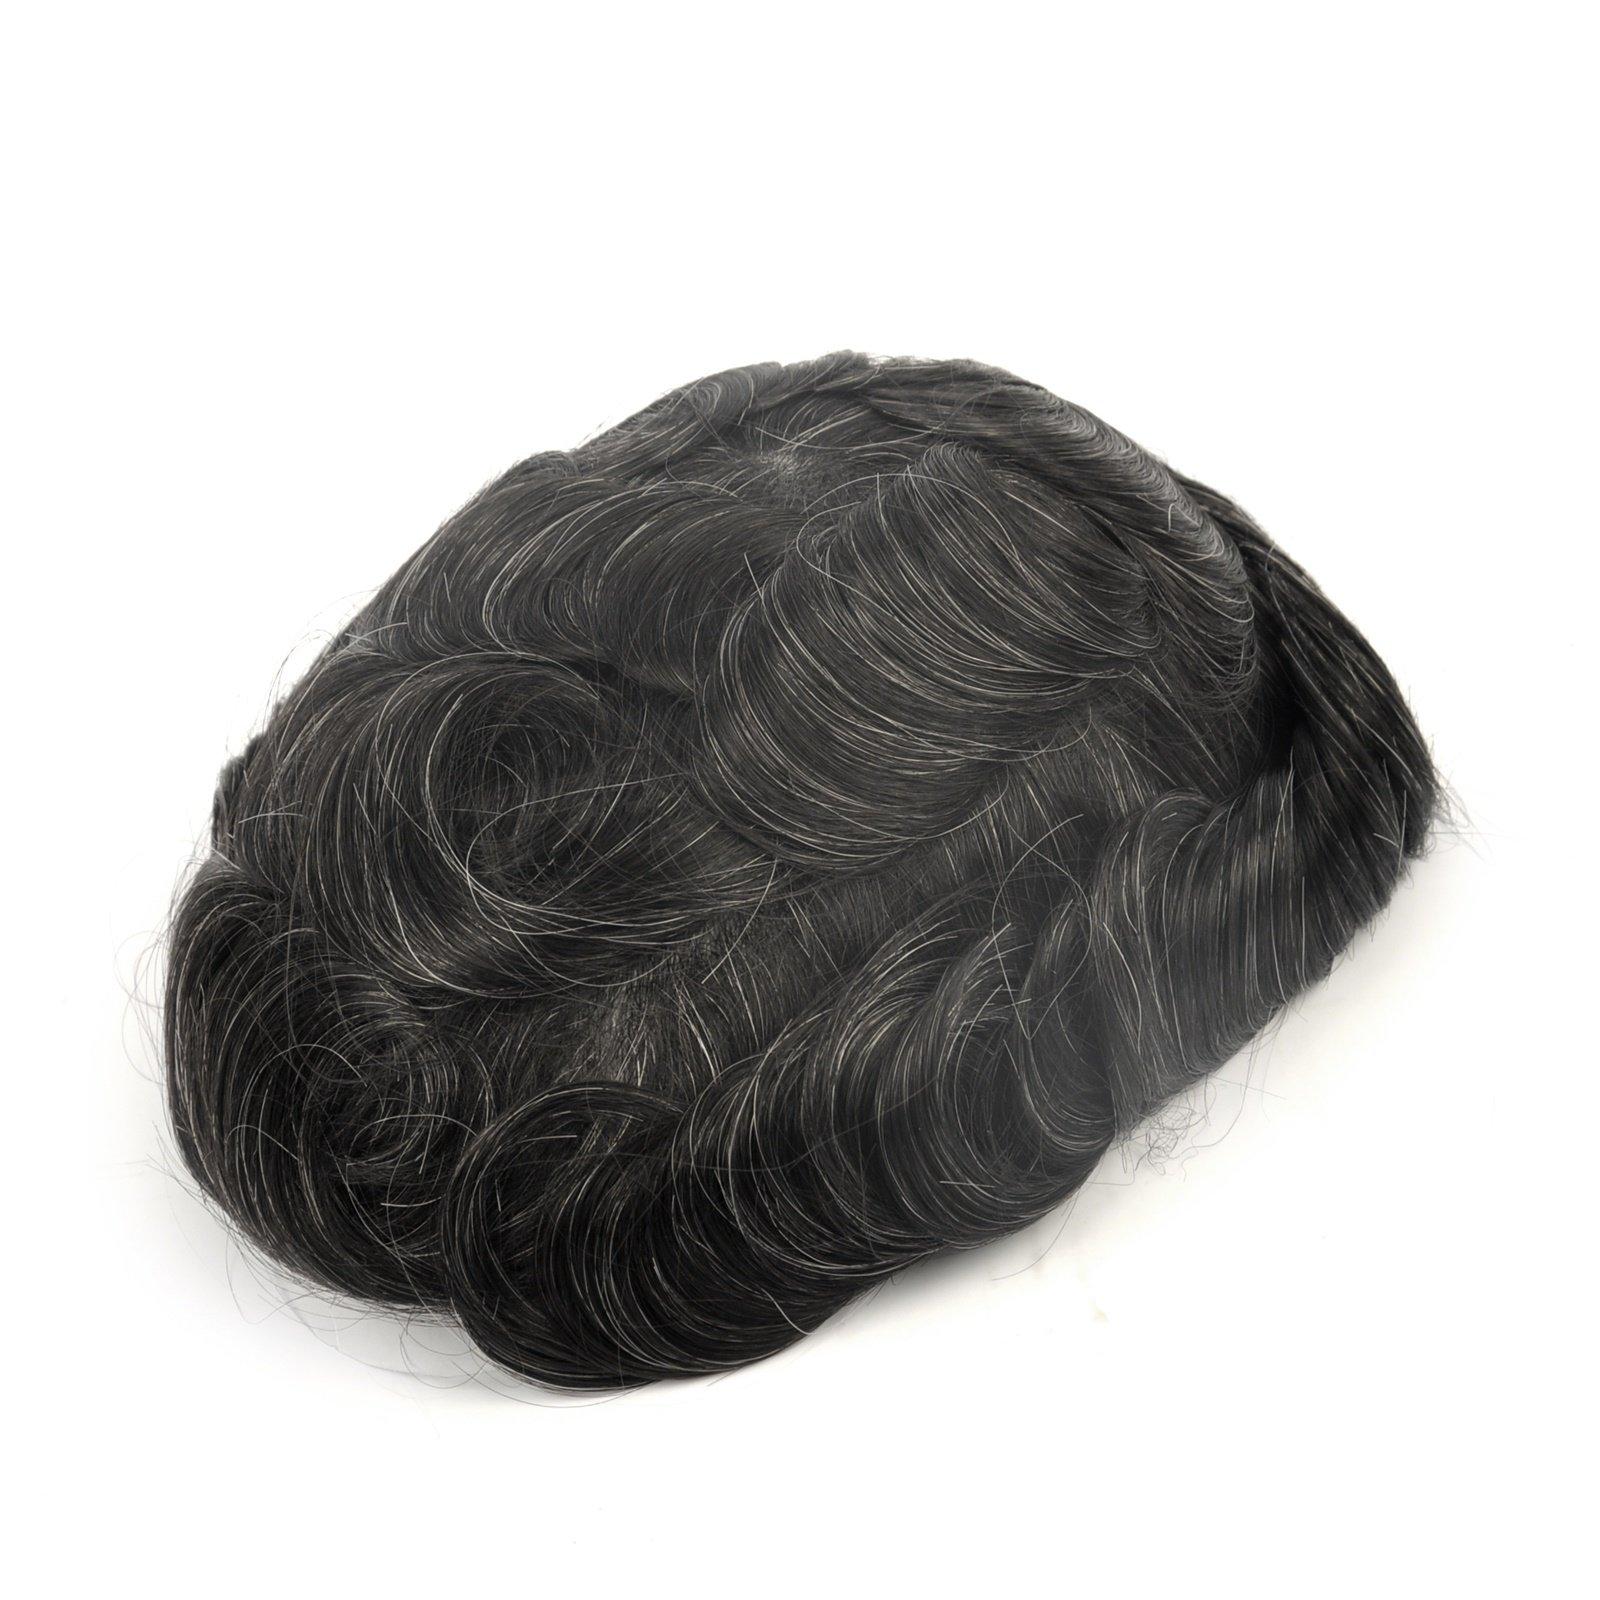 GEX 63Colors Men's HairPiece Toupee Medium Density Wig Human Hair Replacement Systems Vivid Men's Toupee Bella Basement (1B20#)